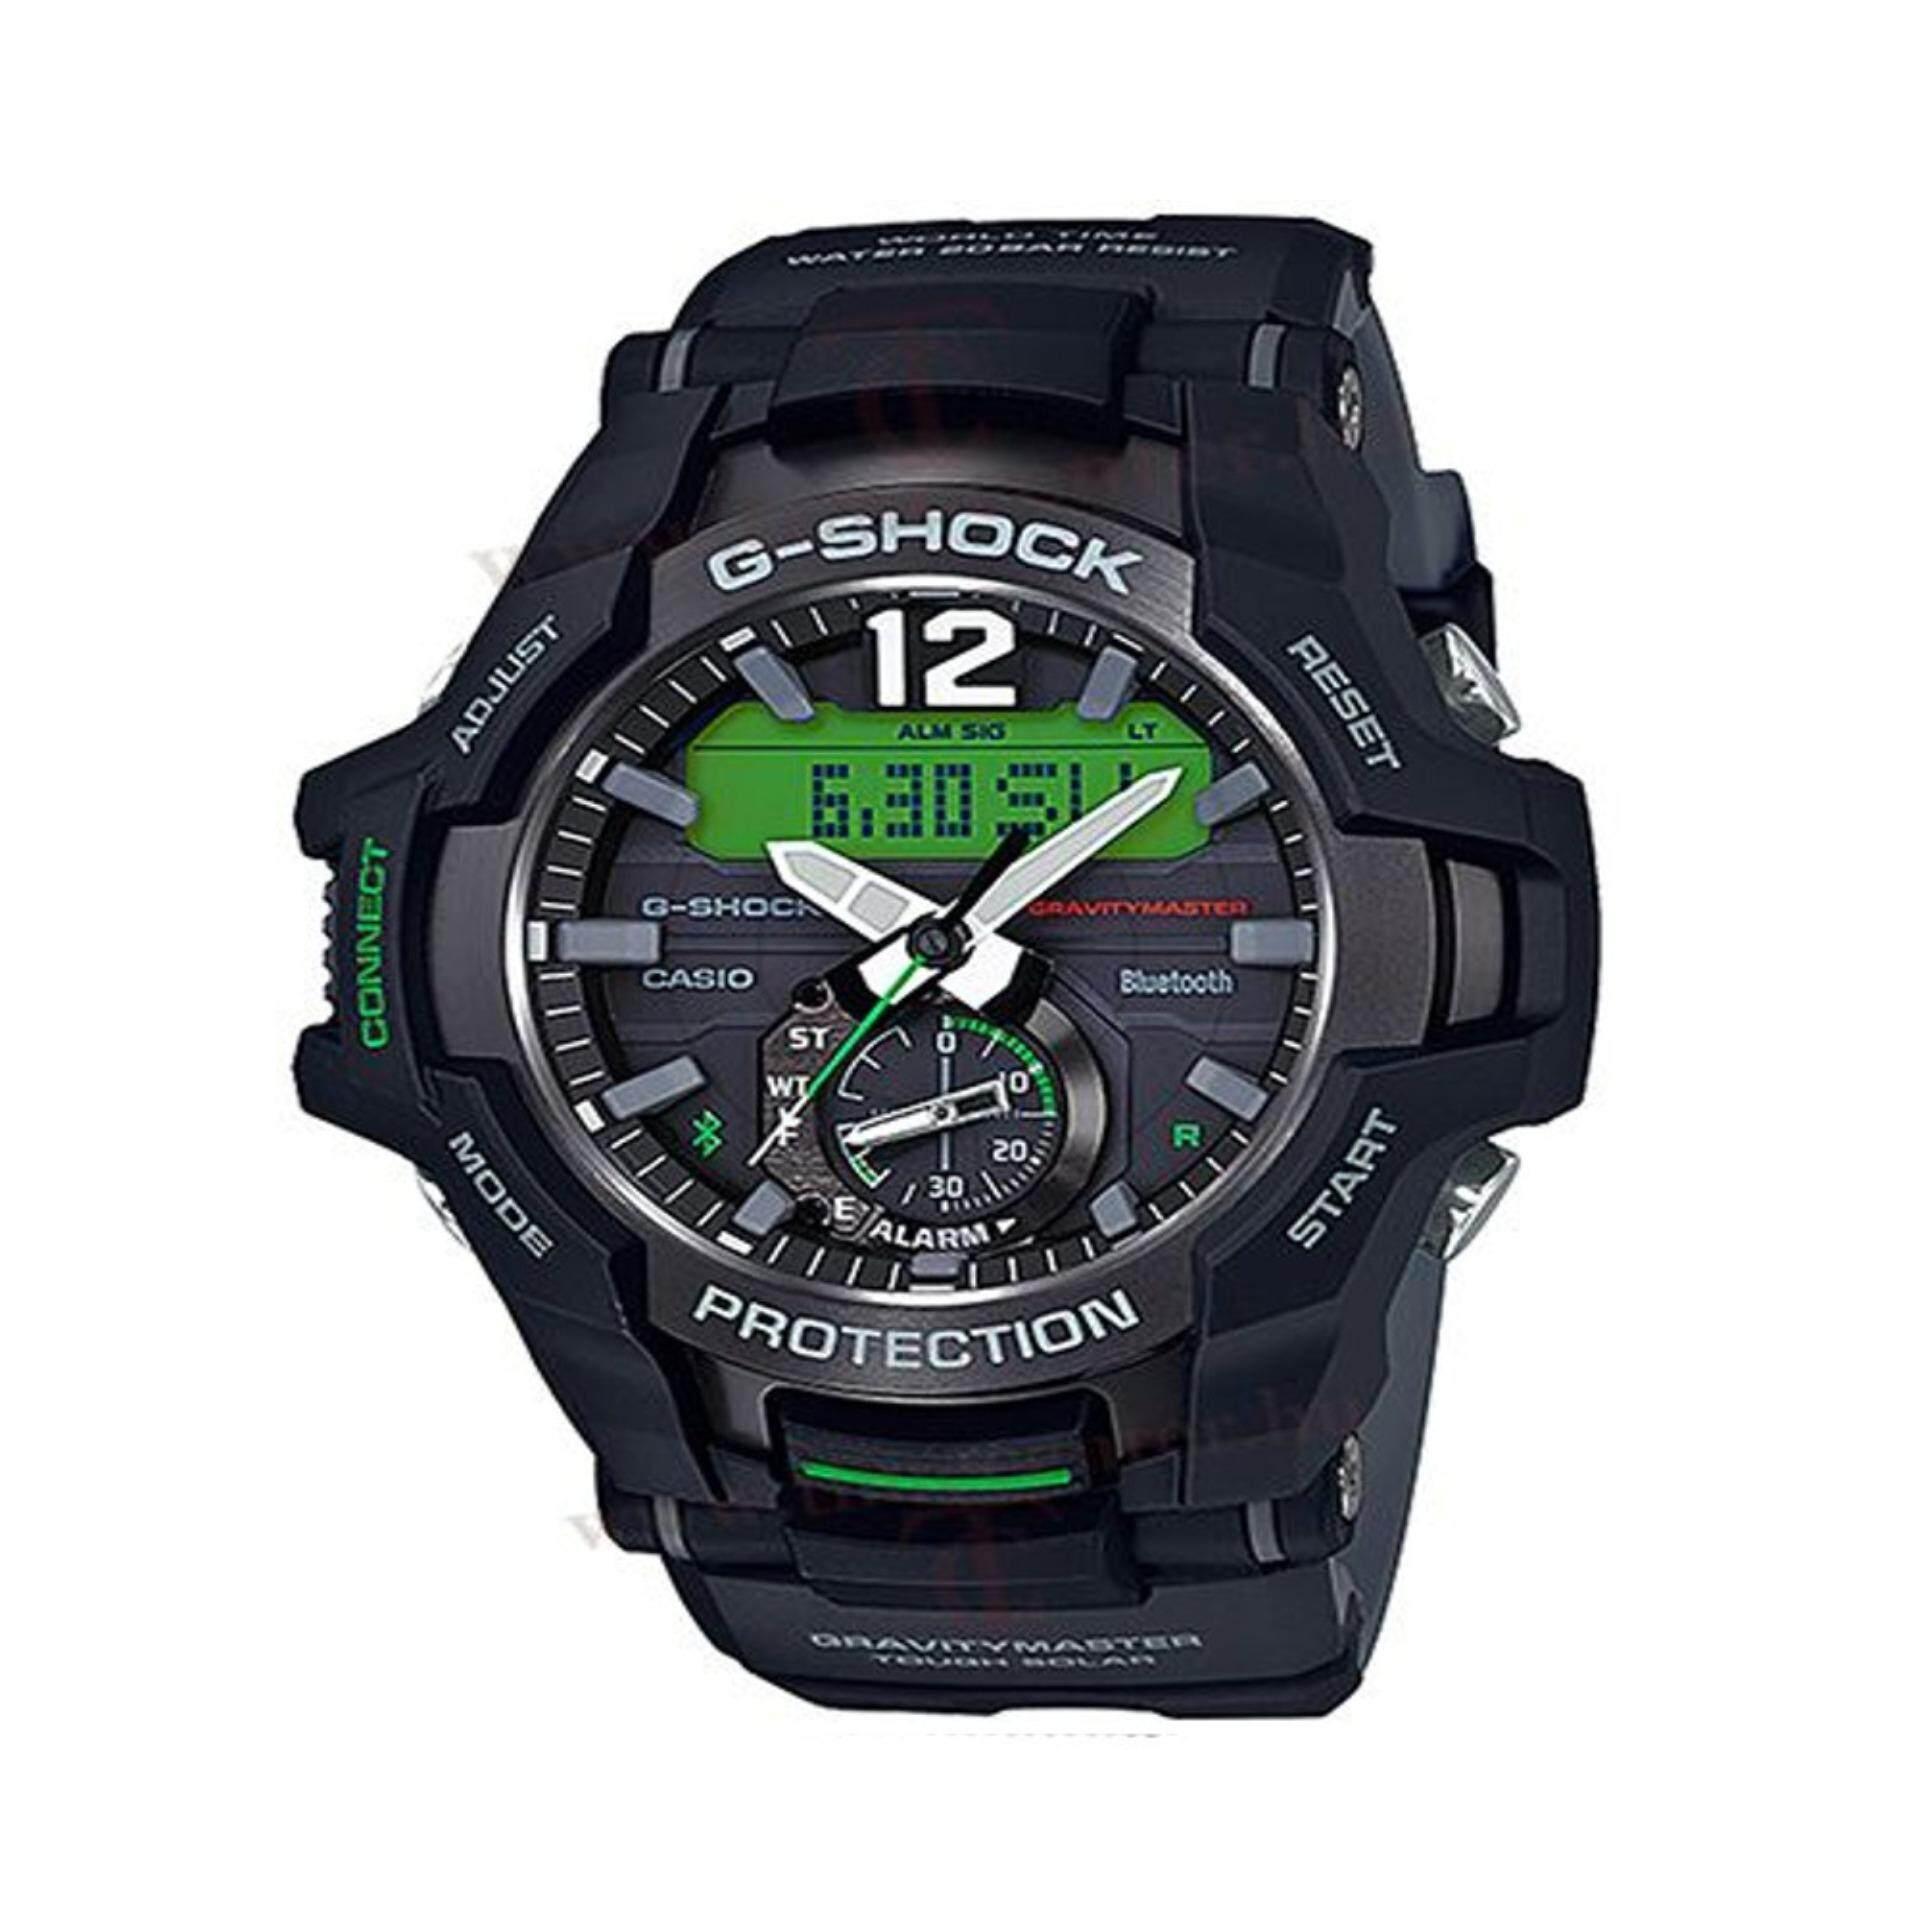 CASIO G-SHOCK SPORT MEN WATCH GR-B100-1A3DR Original   Genuine ( dbe5419615